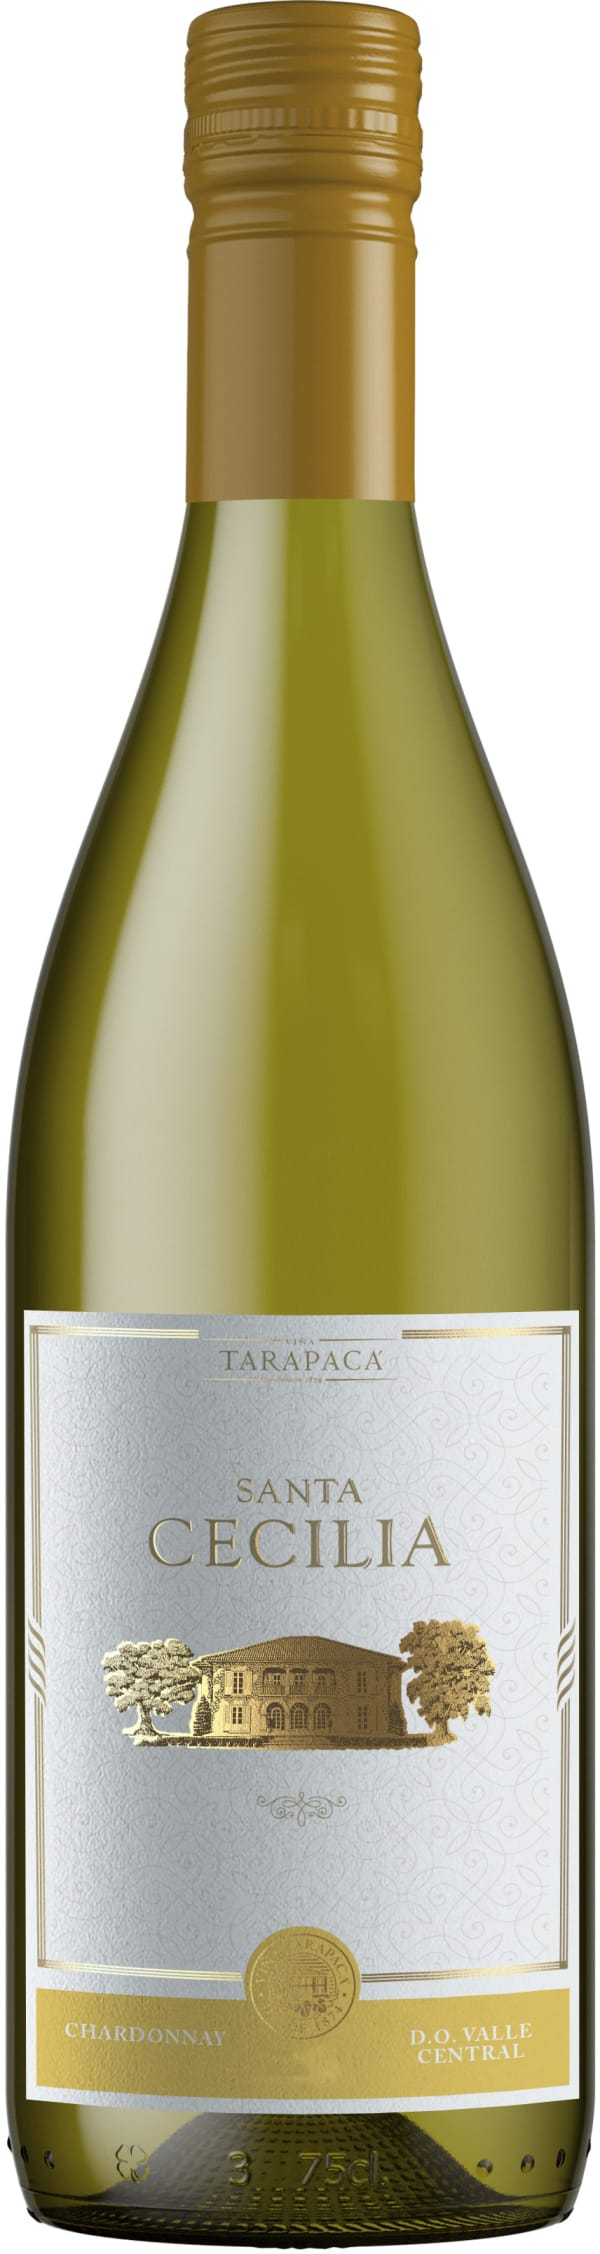 Tarapacá Santa Cecilia Chardonnay 2020